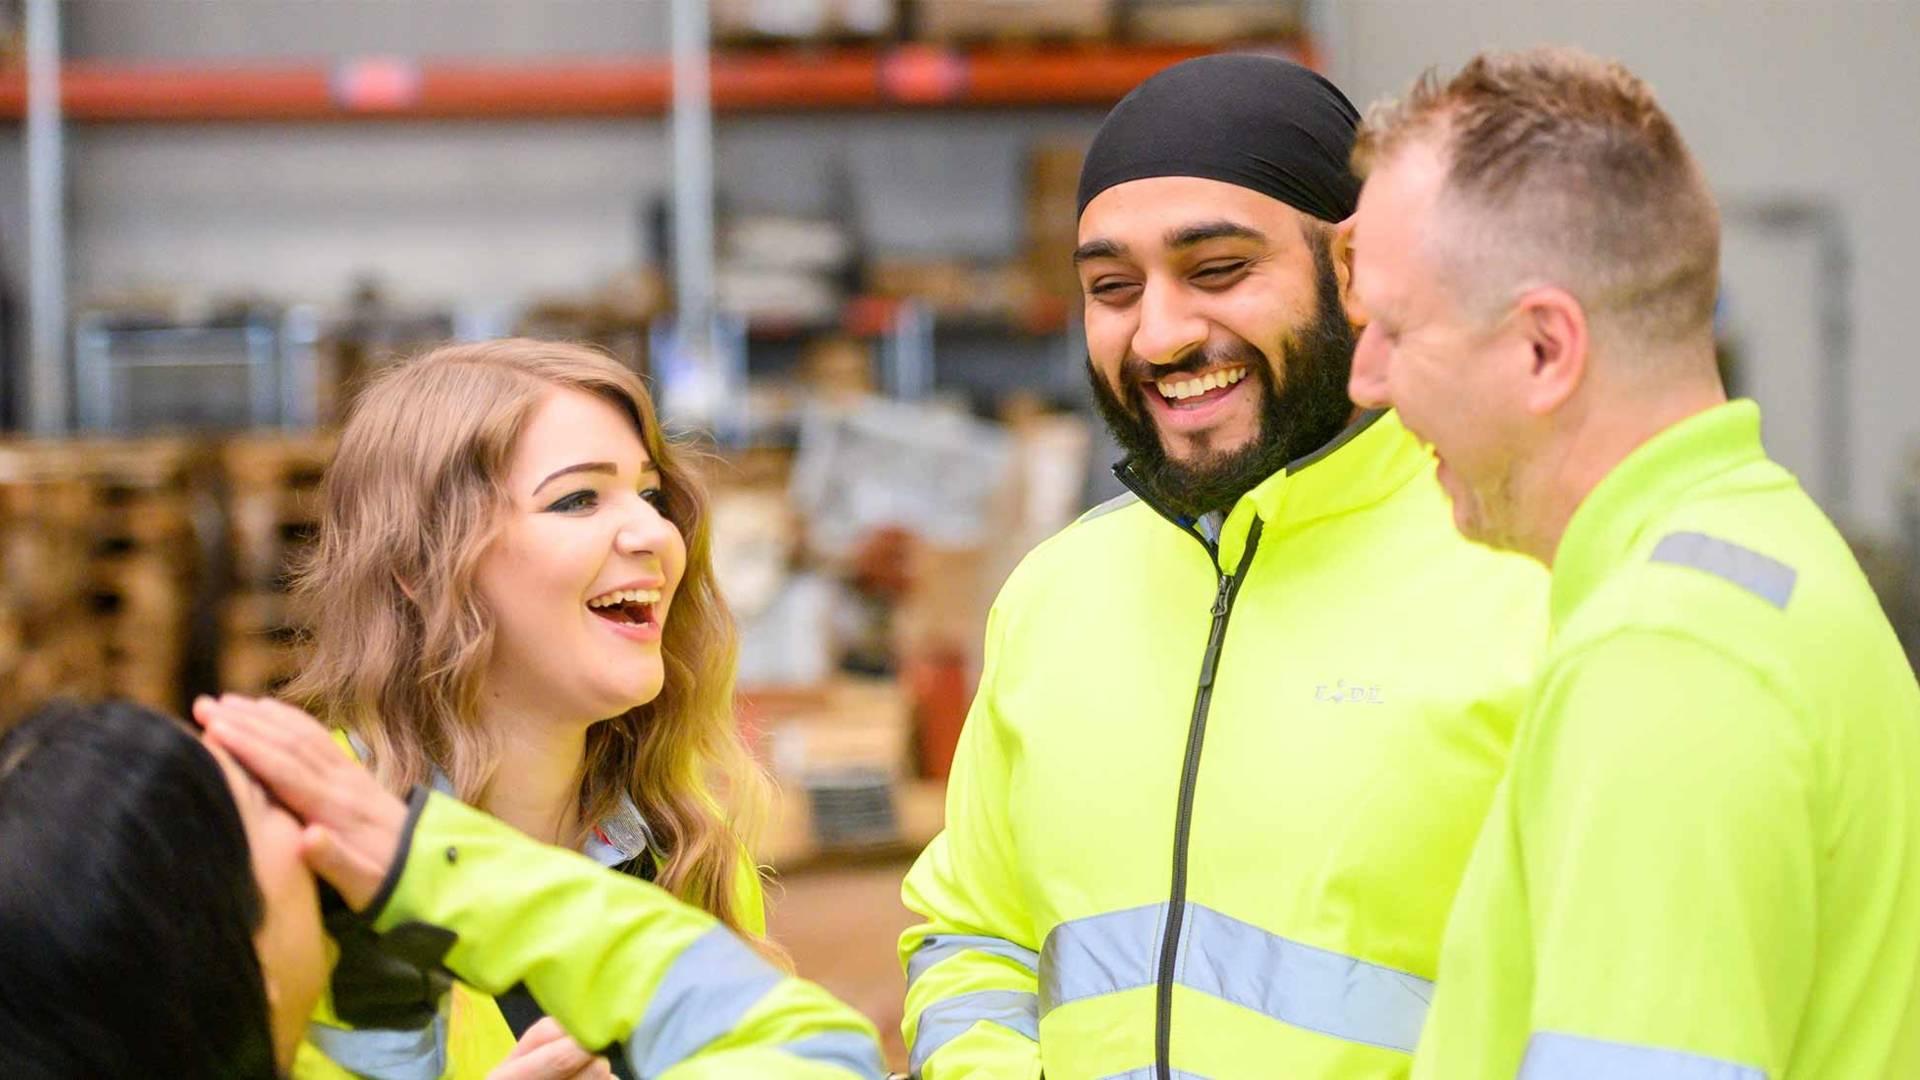 Lidl warehouse jobs